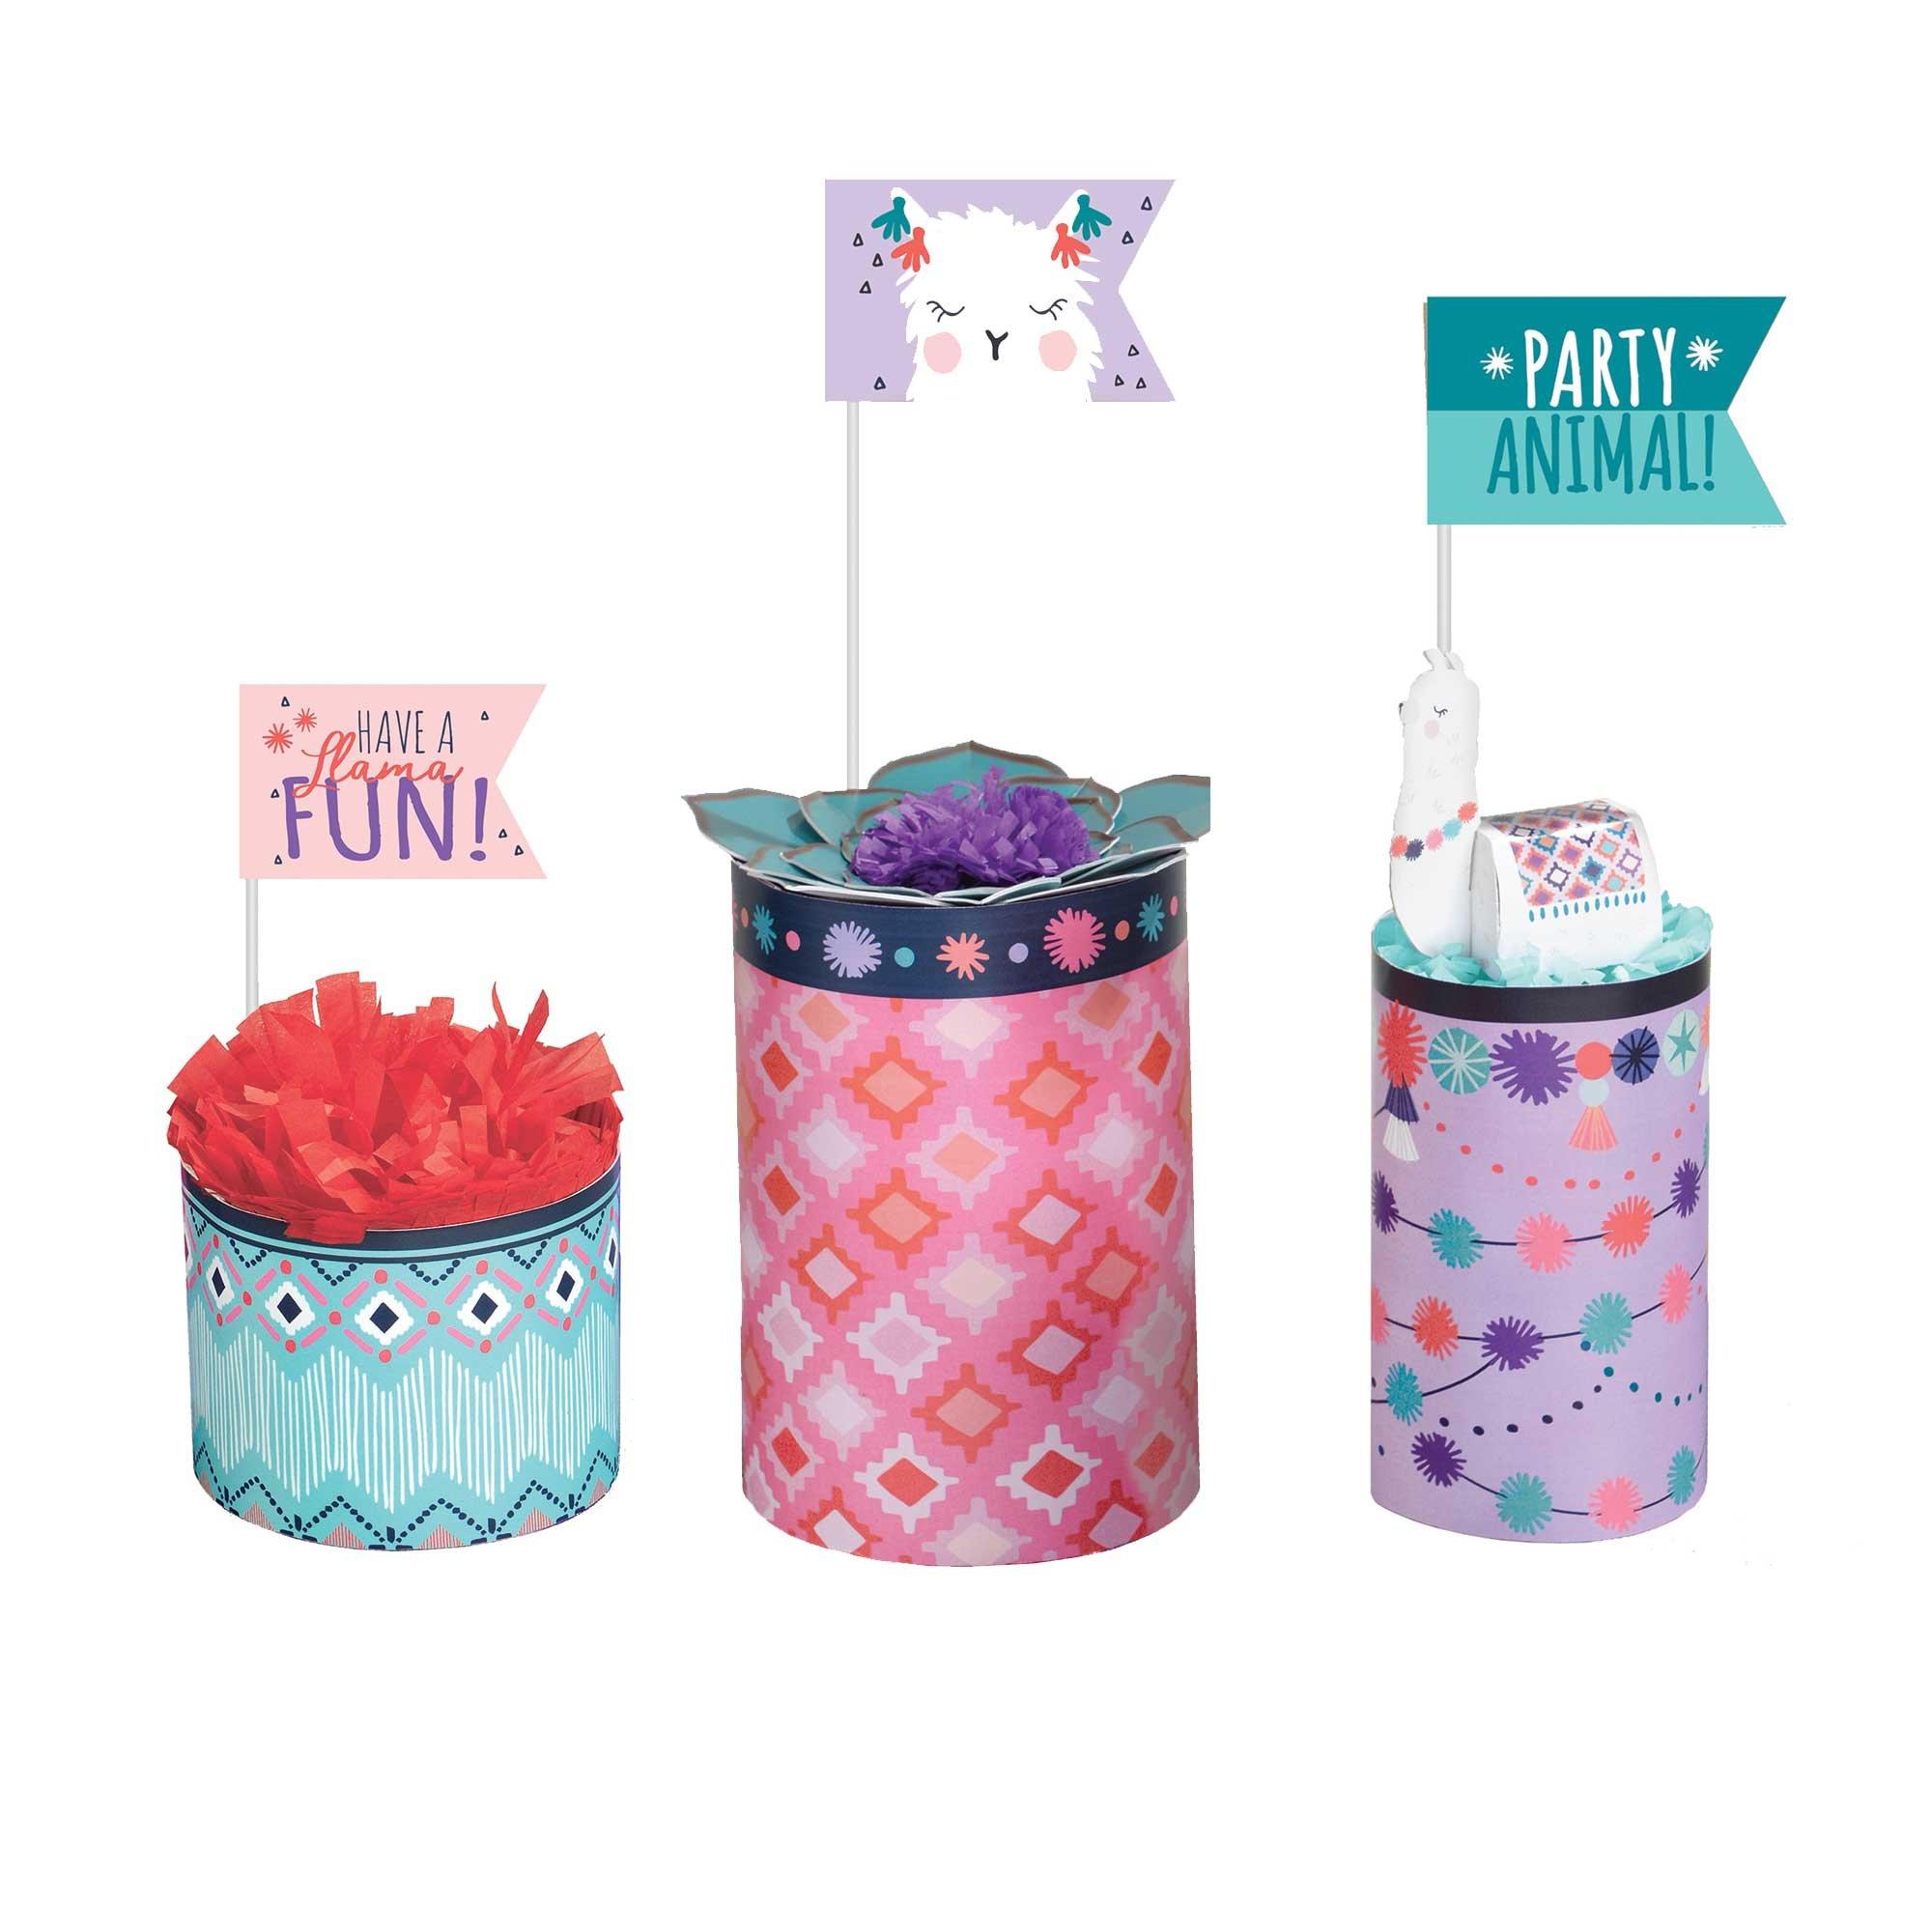 Llama Fun Centrepiece Decorating Kit